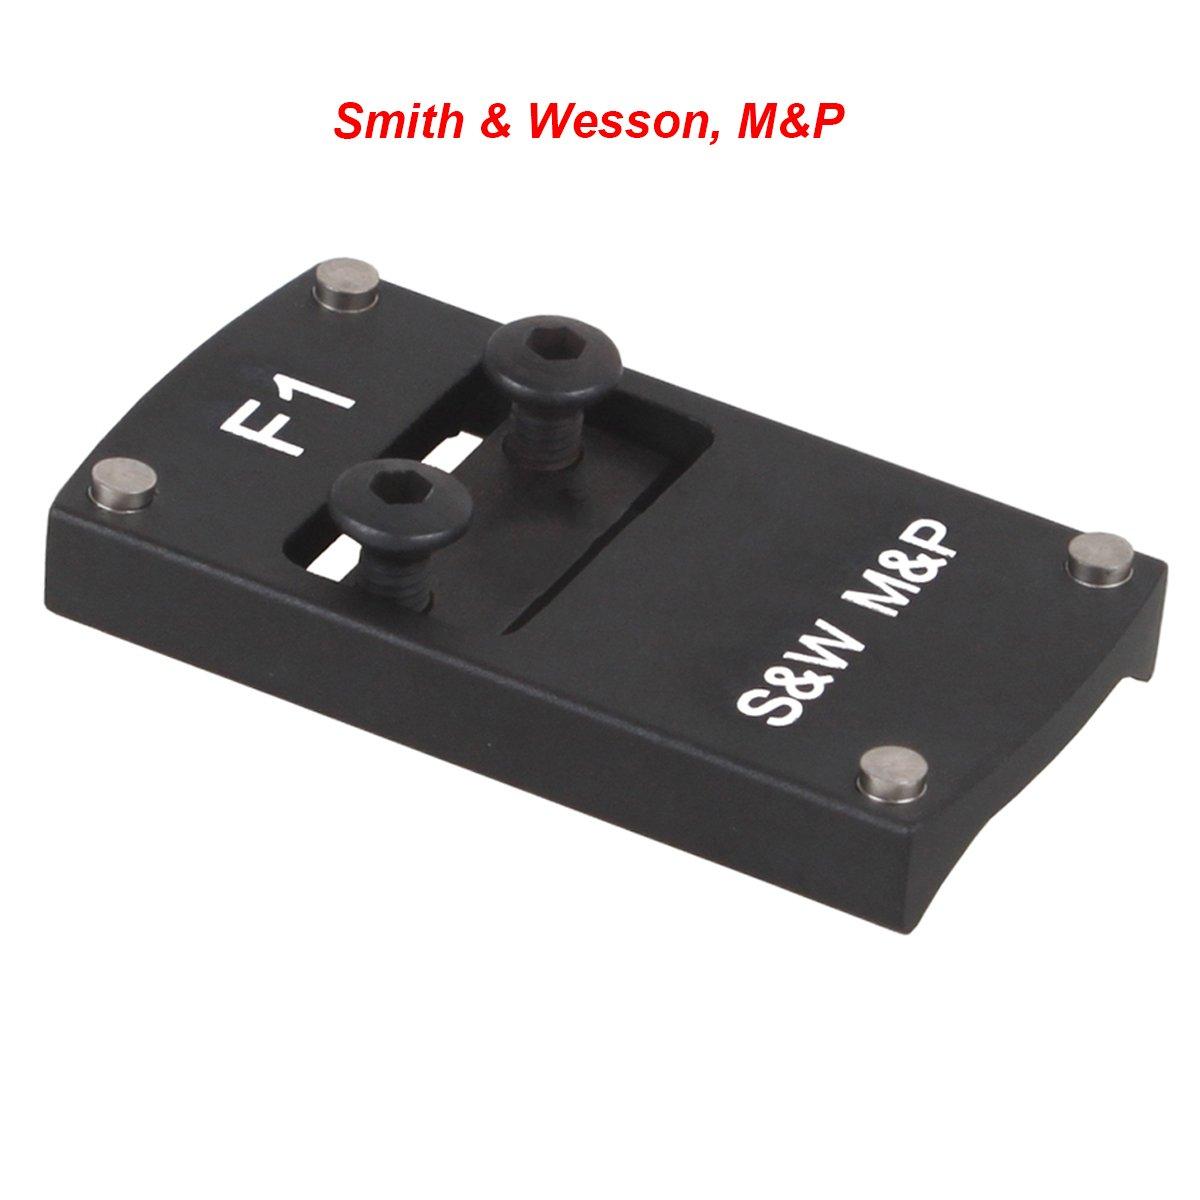 Vector Optics Sphinx Mini Red Dot Scope Sight Mount Base for Pistol GLOCK, M1911, SIG Sauer P226, Baretta 92, Springfield XD, Smith & Wesson, M&P, HK USP (Black) (Smith & Wesson, M&P) by Vector Optics